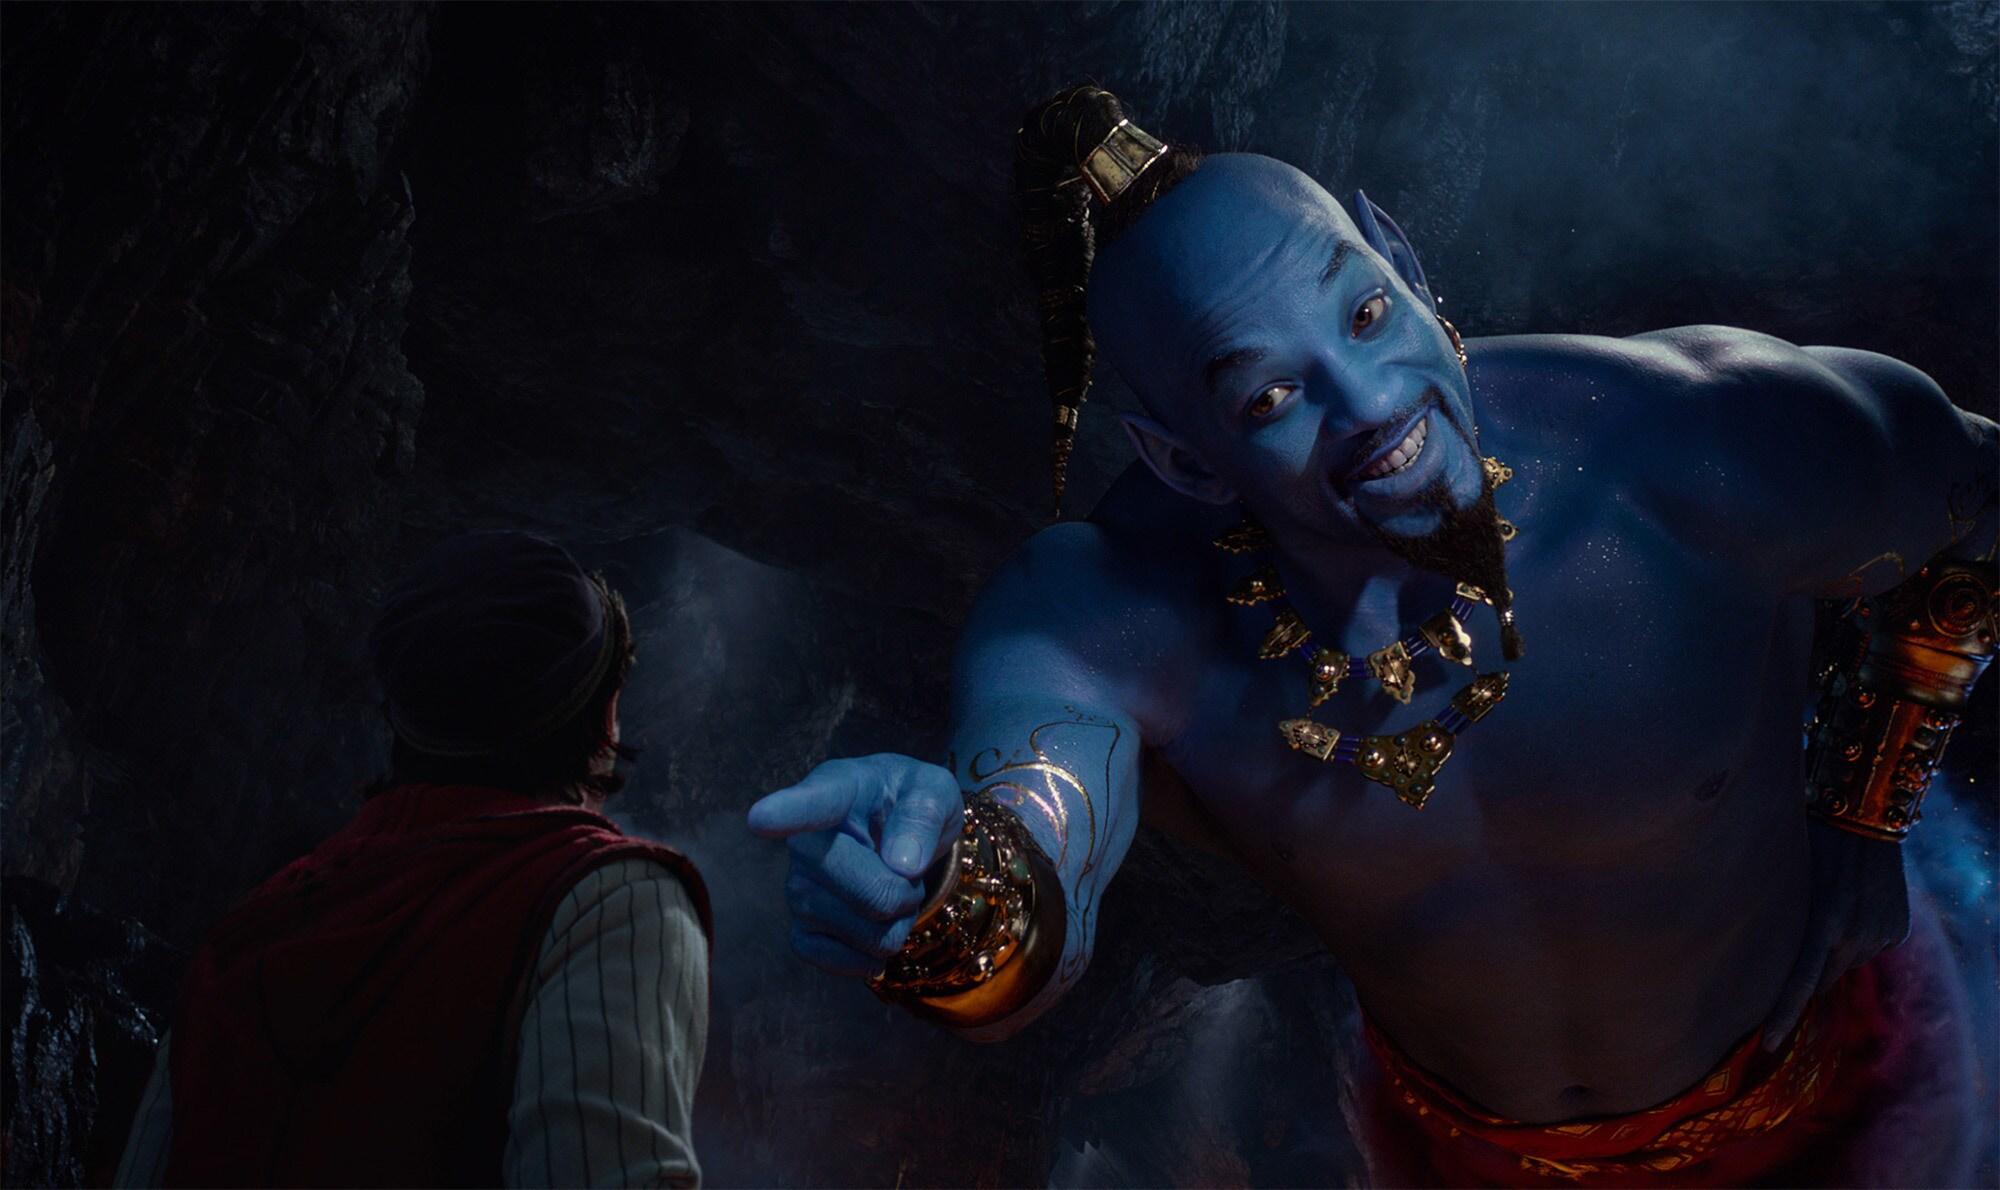 Aladdin | Trailer02